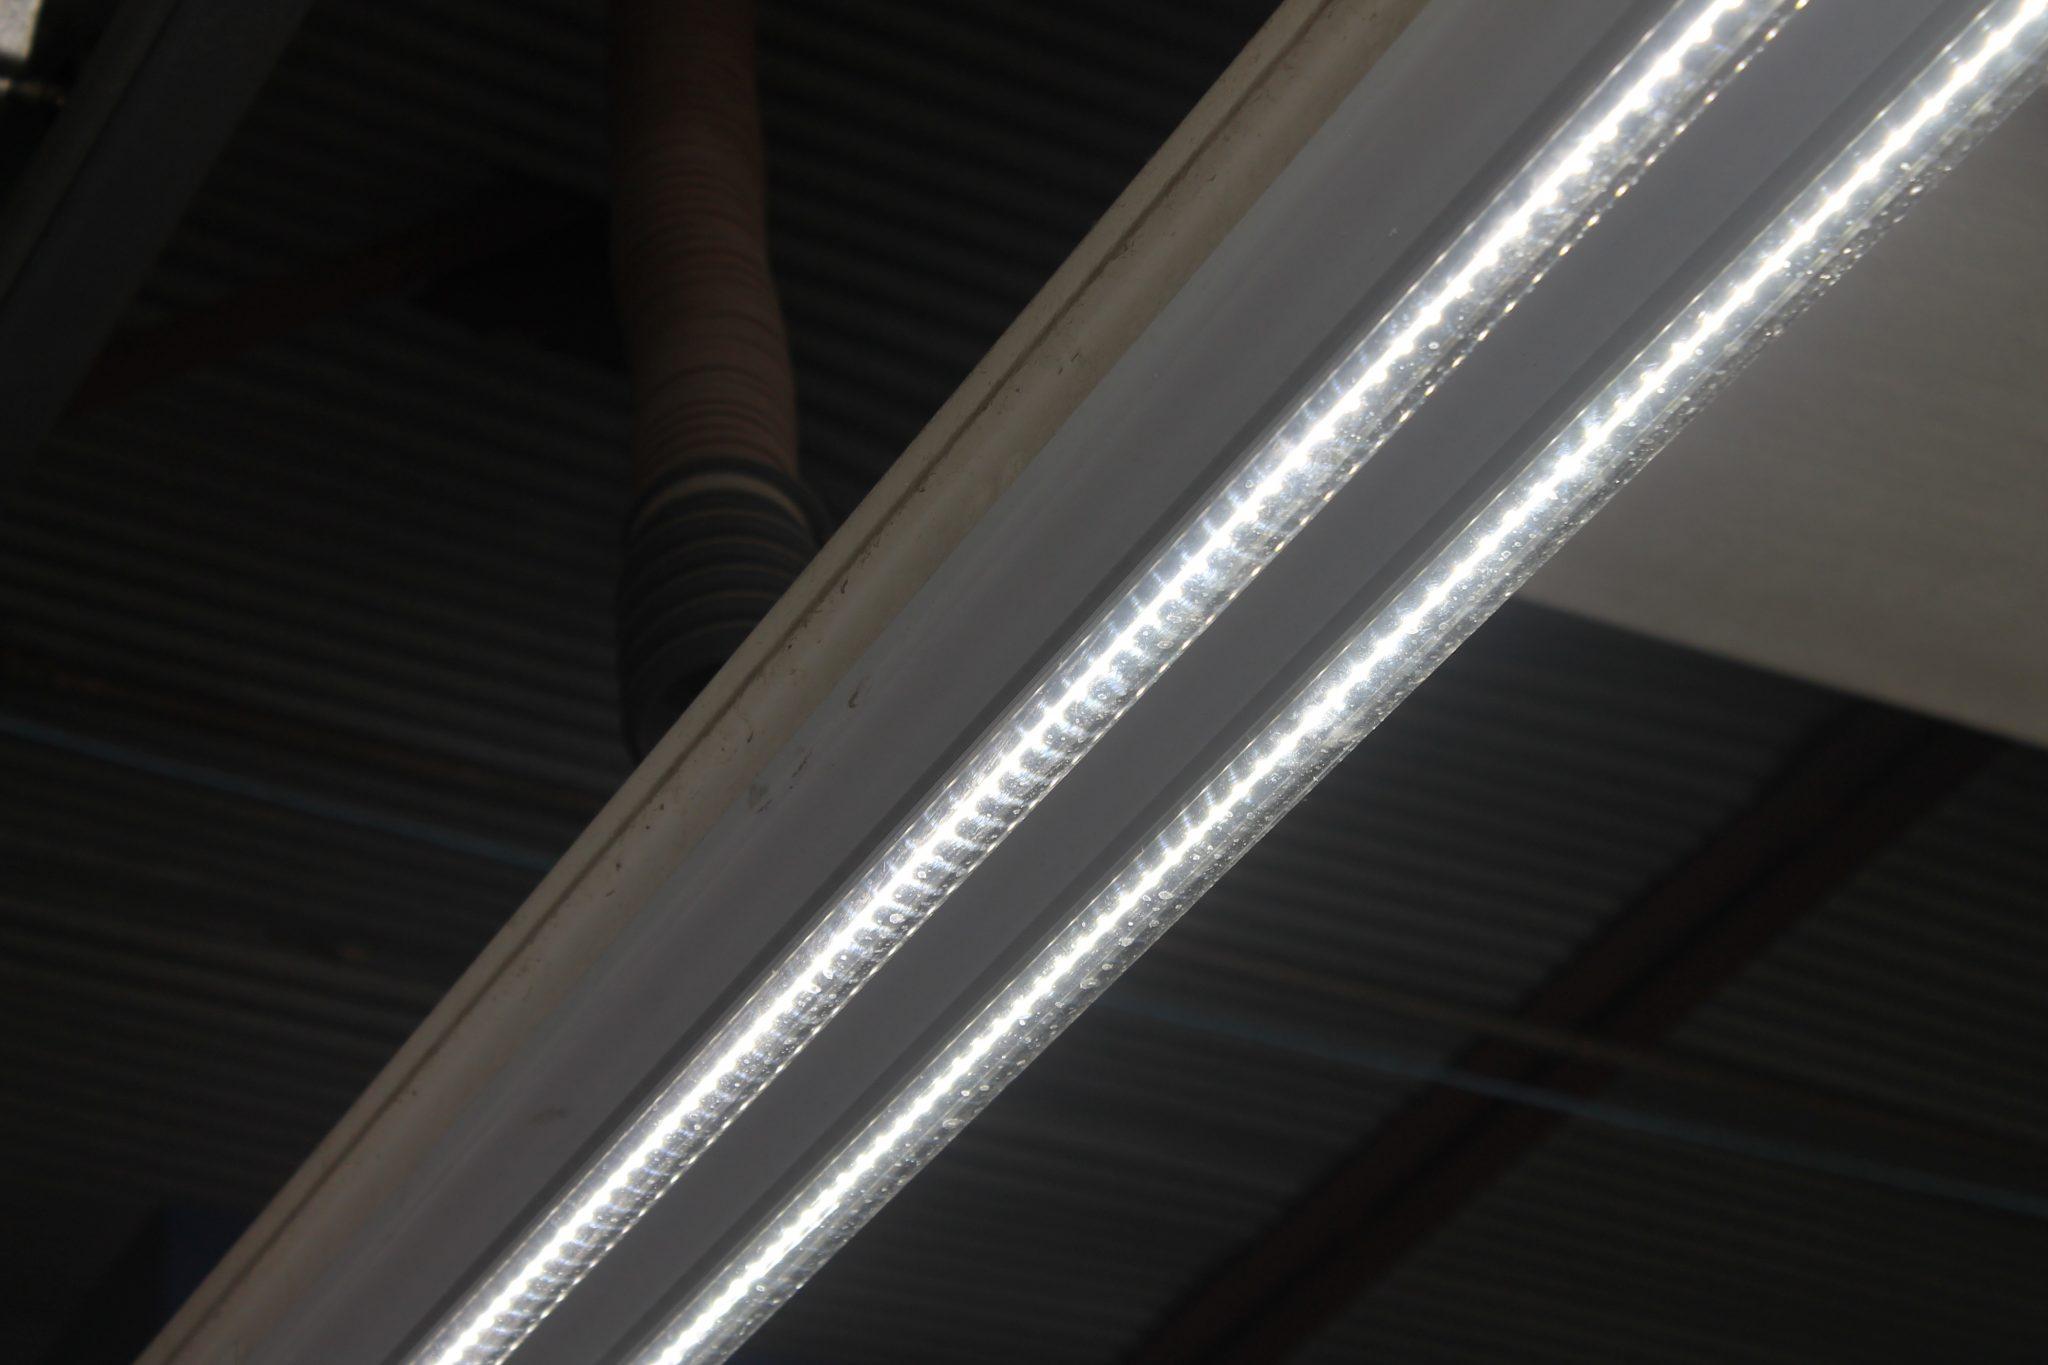 Commercial Lighting Sitlers LED Supplies Washington Cedar